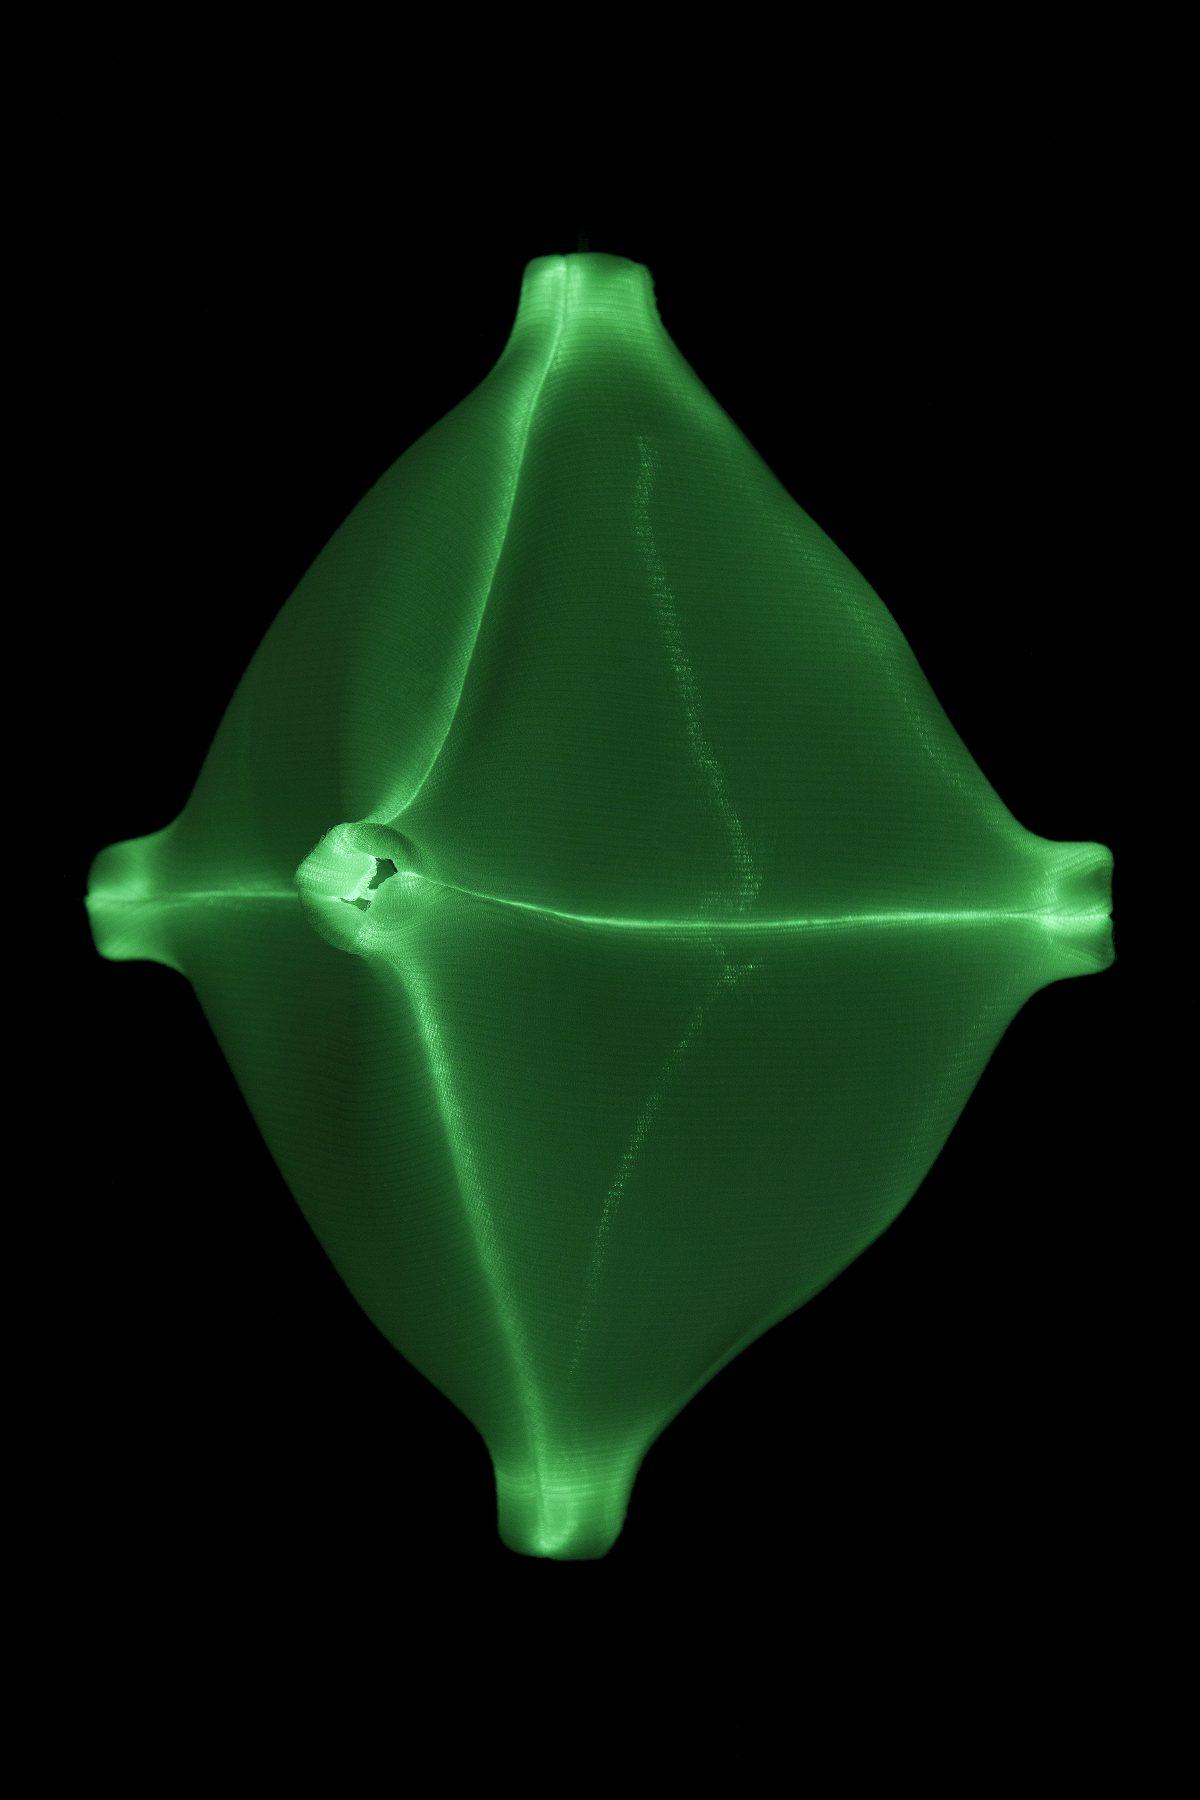 Radiolaria Hexapodus inflatus glow-in-the-dark hanglamp van Bernotat